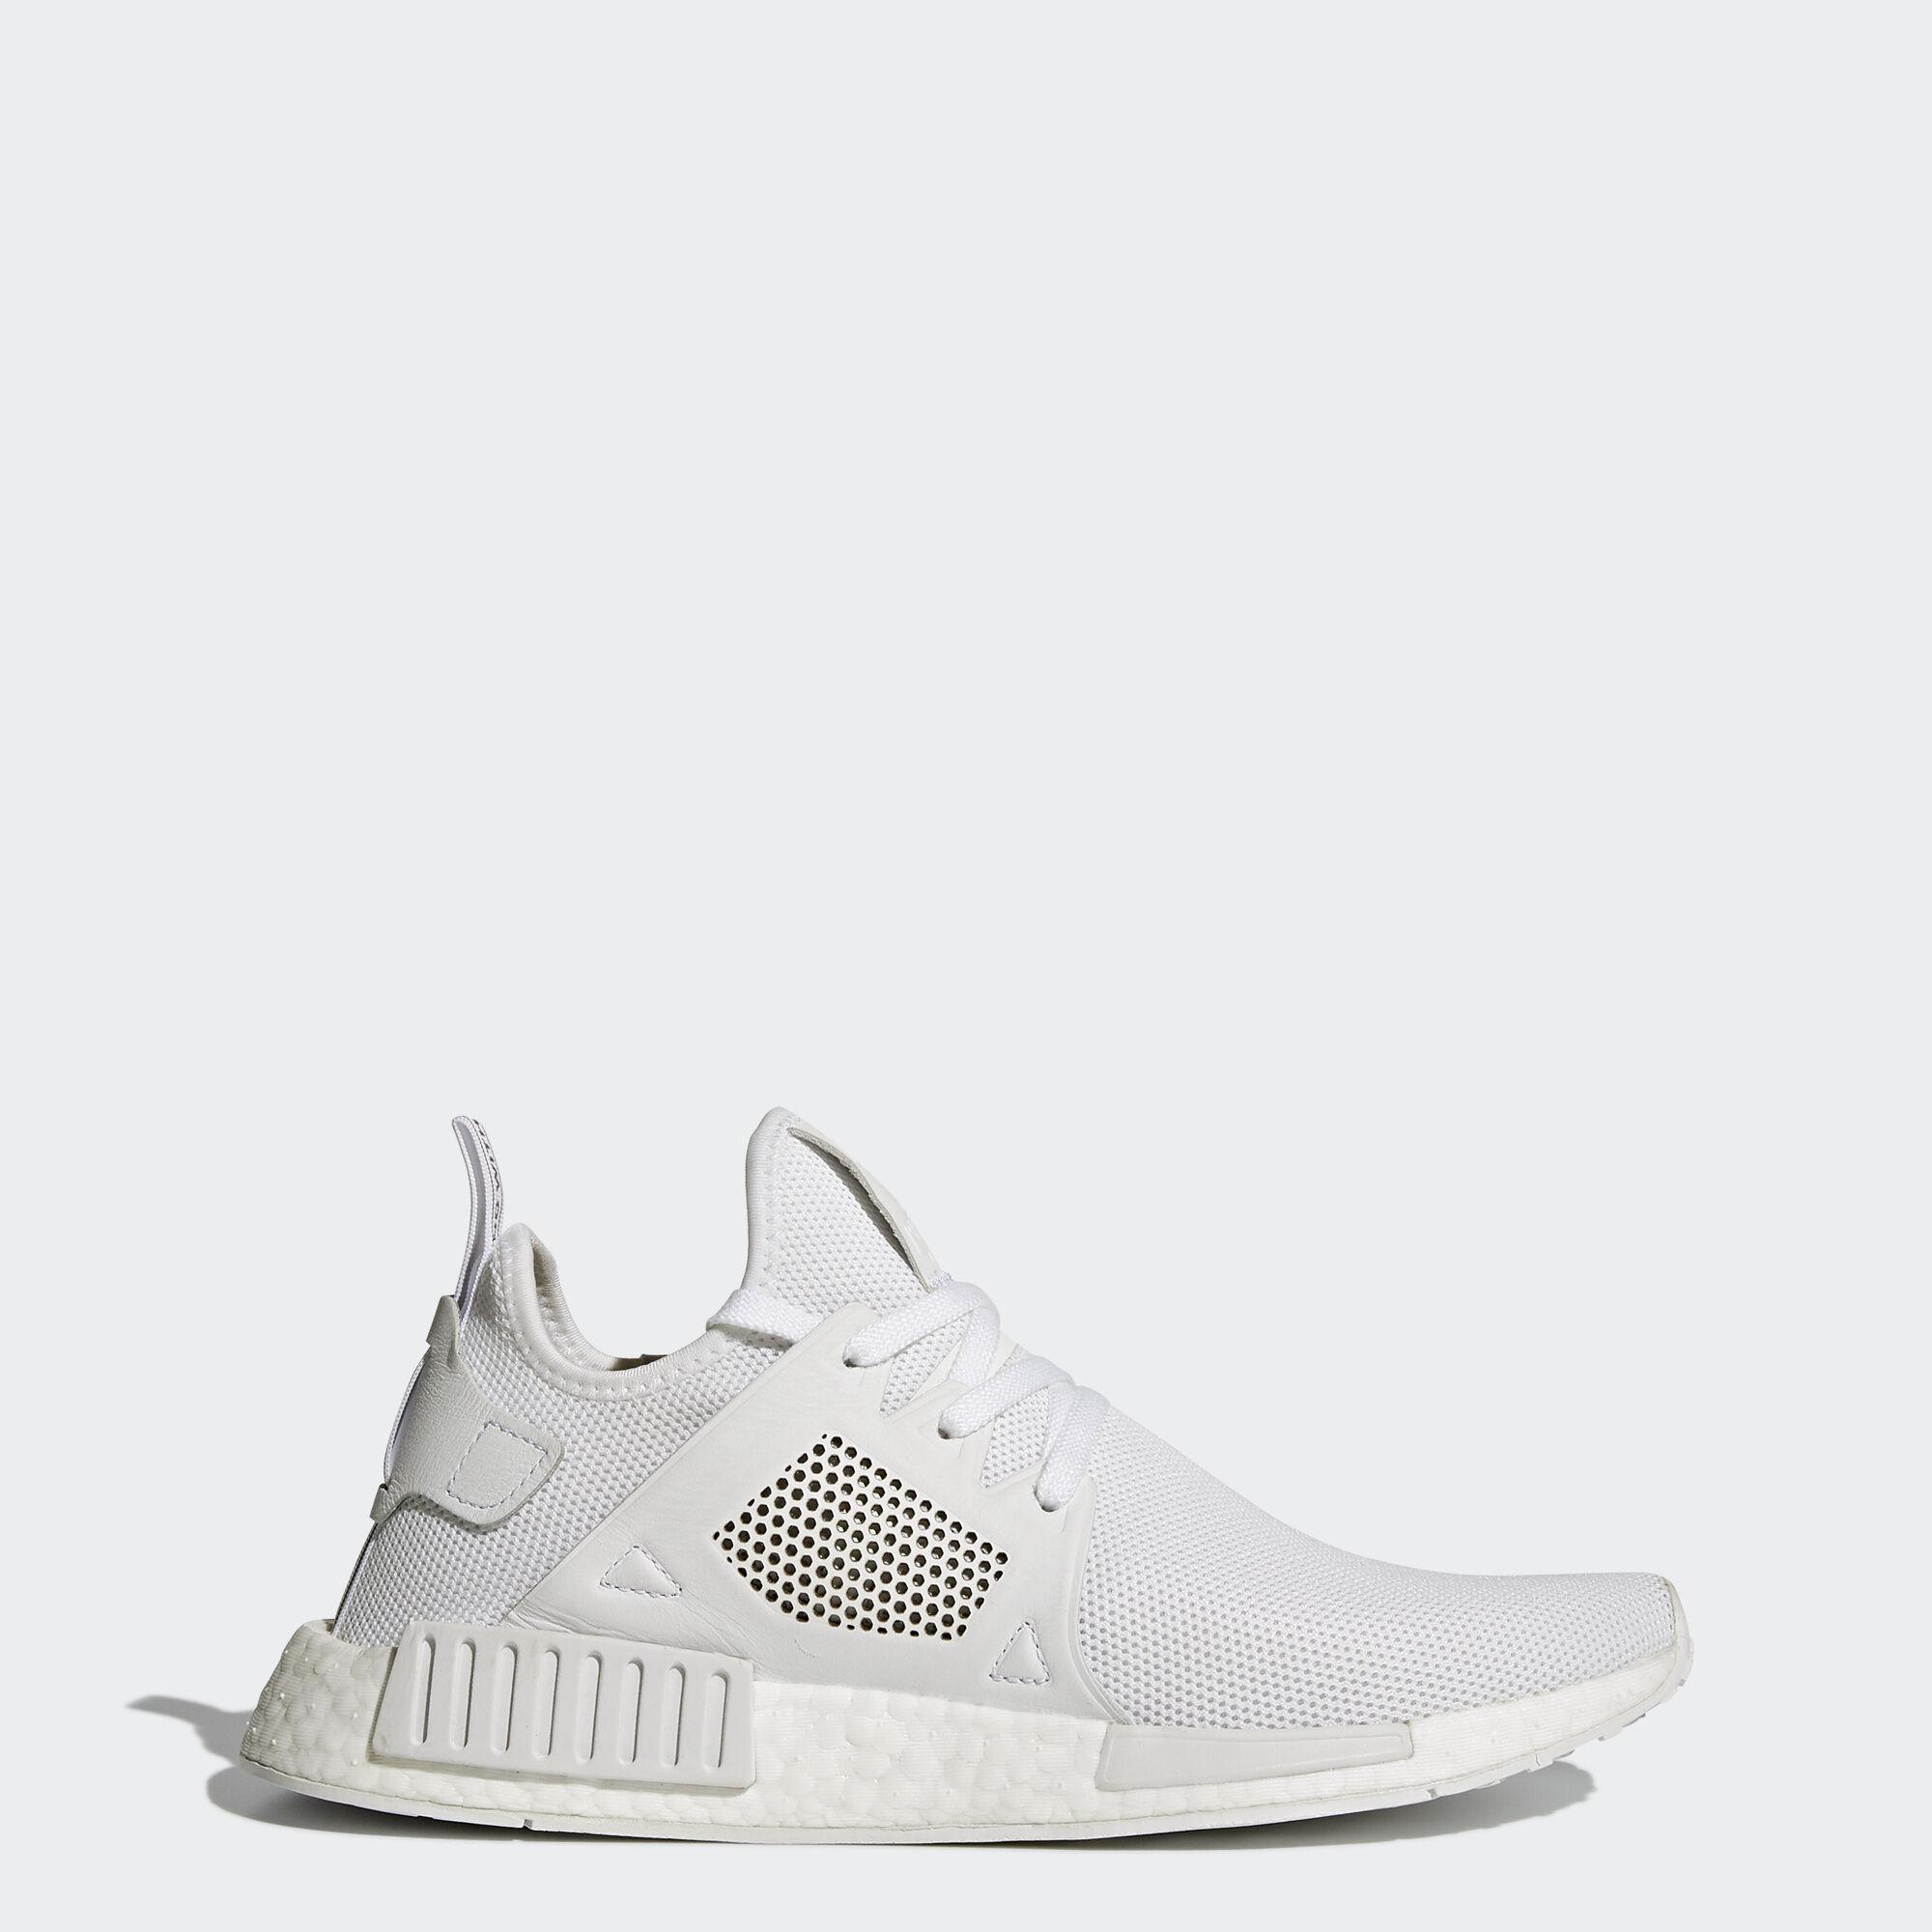 Adidas NMDXR1 Shoes Footwear White Footwear White Footwear White BY9922